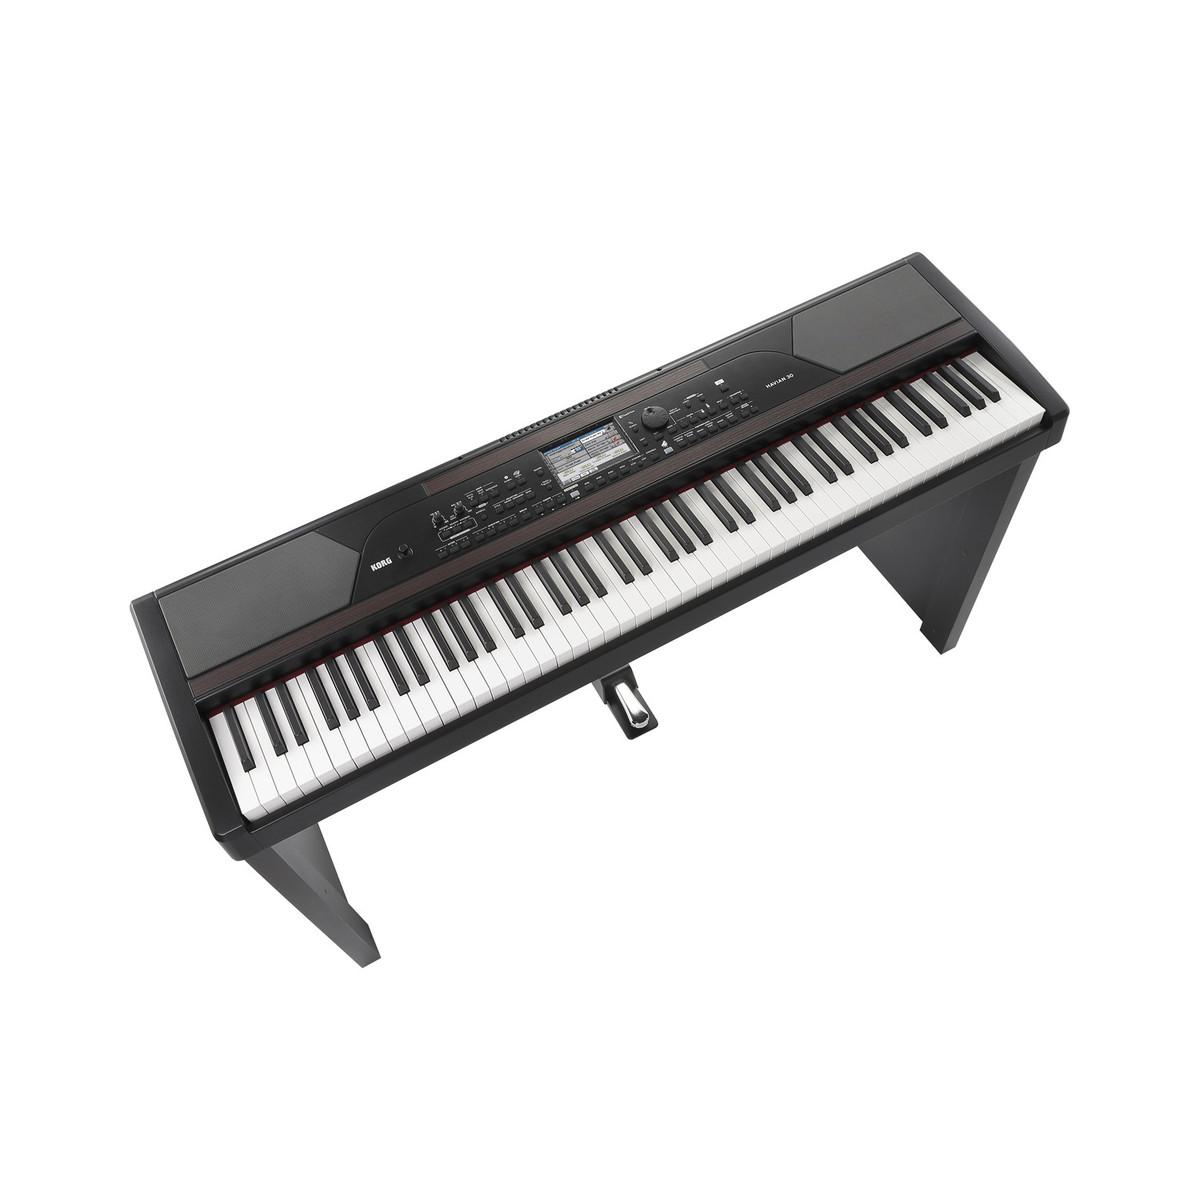 korg havian 30 ensemble piano num rique comme neuf. Black Bedroom Furniture Sets. Home Design Ideas